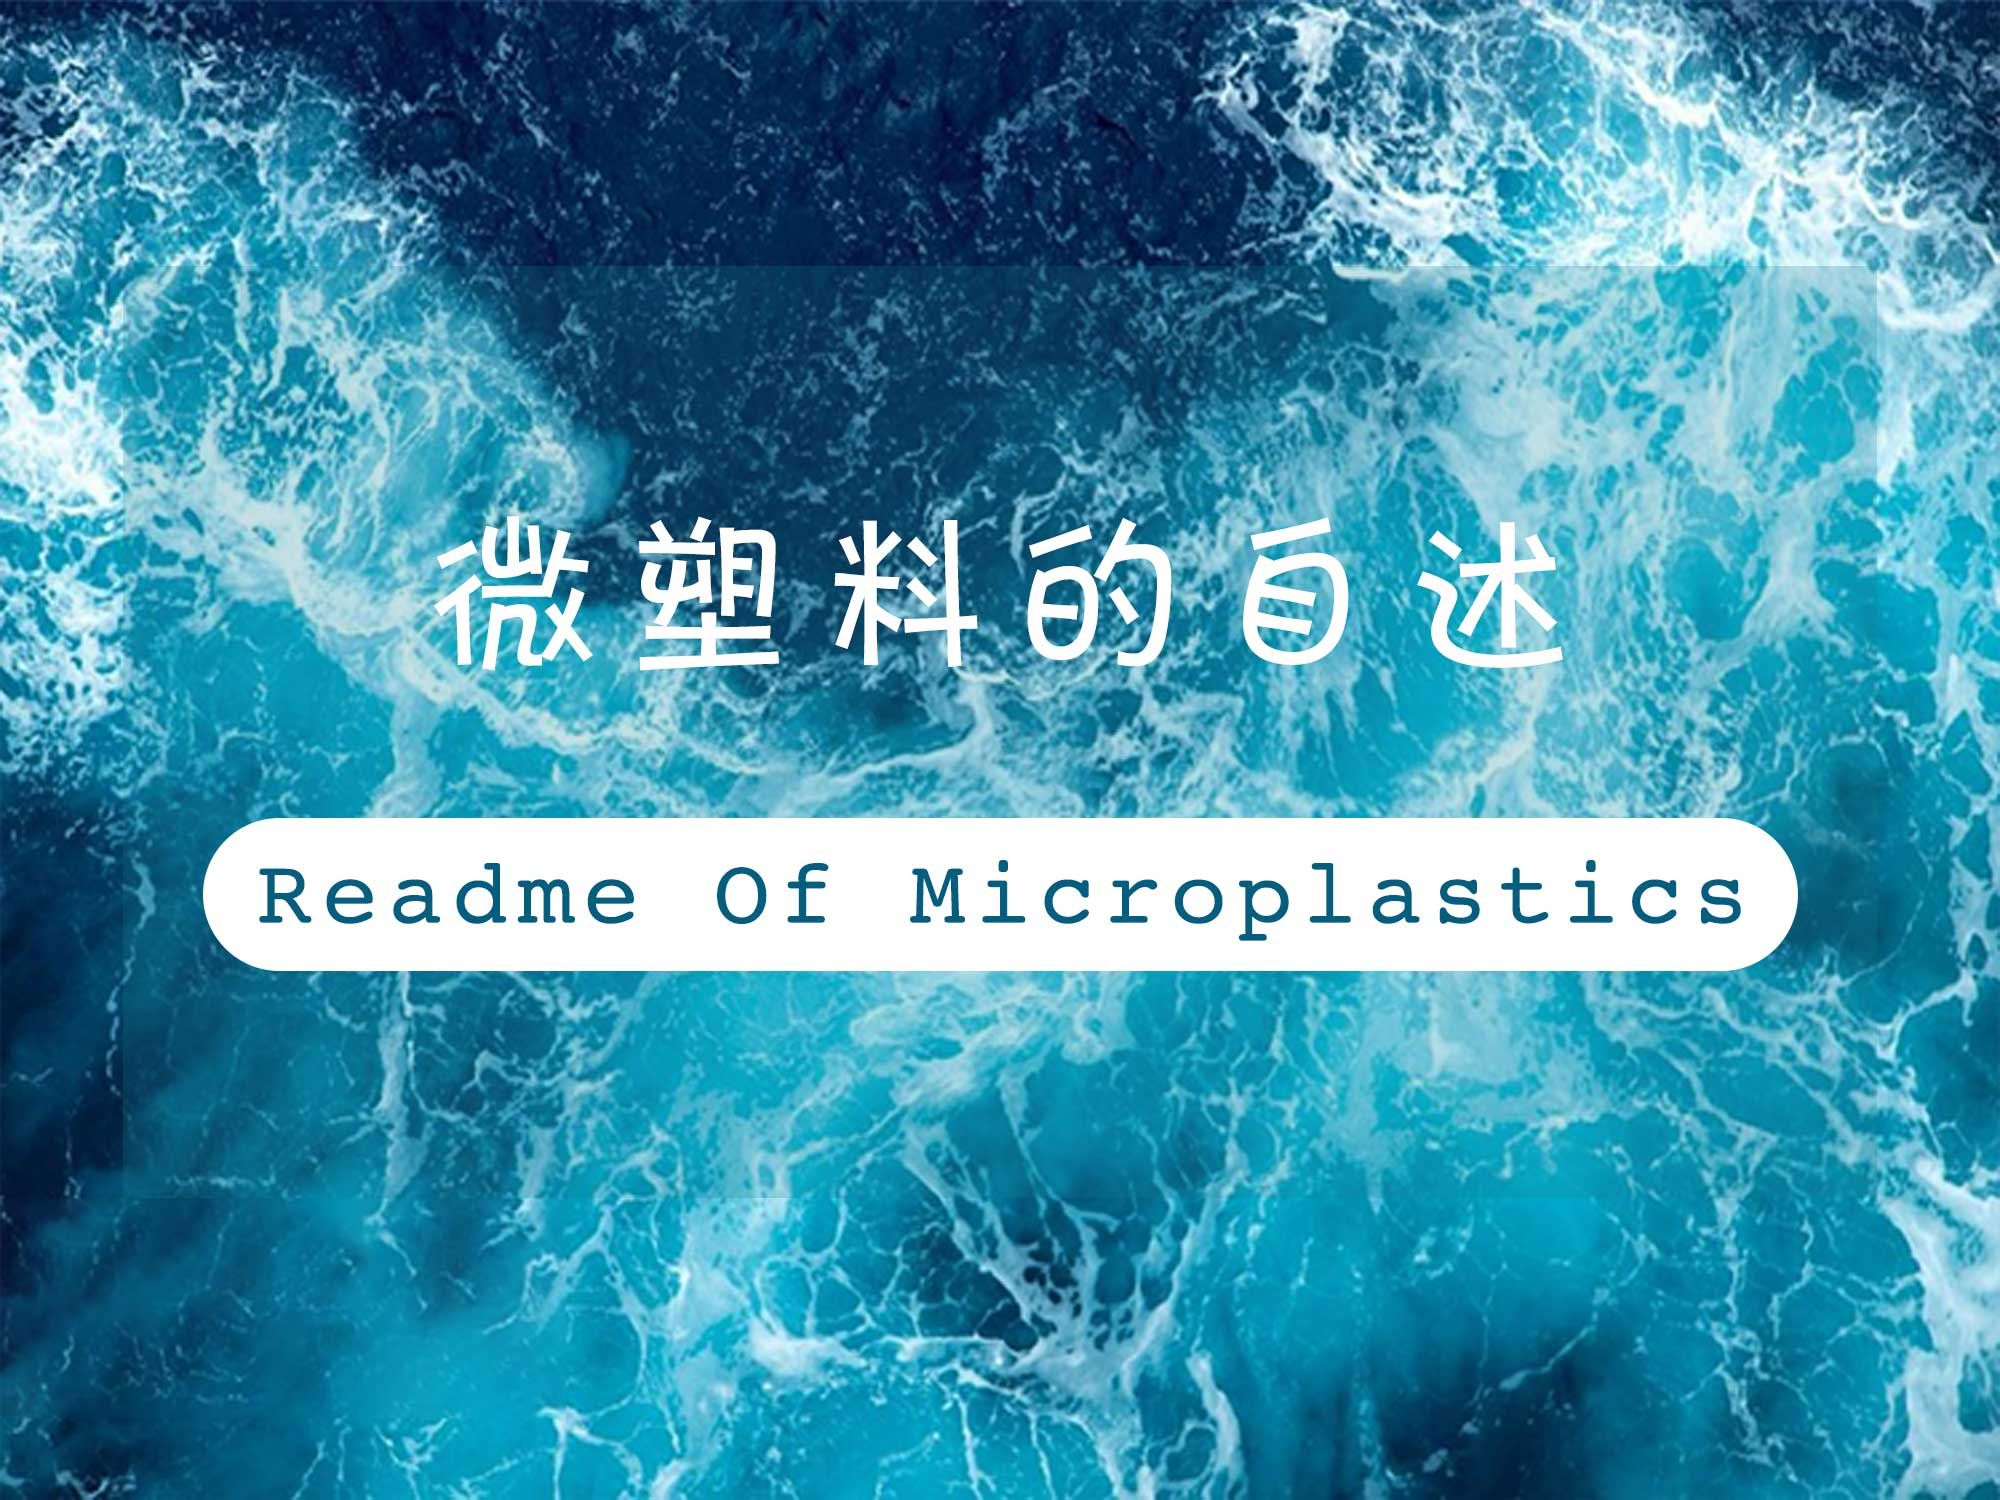 Readme of microplastics